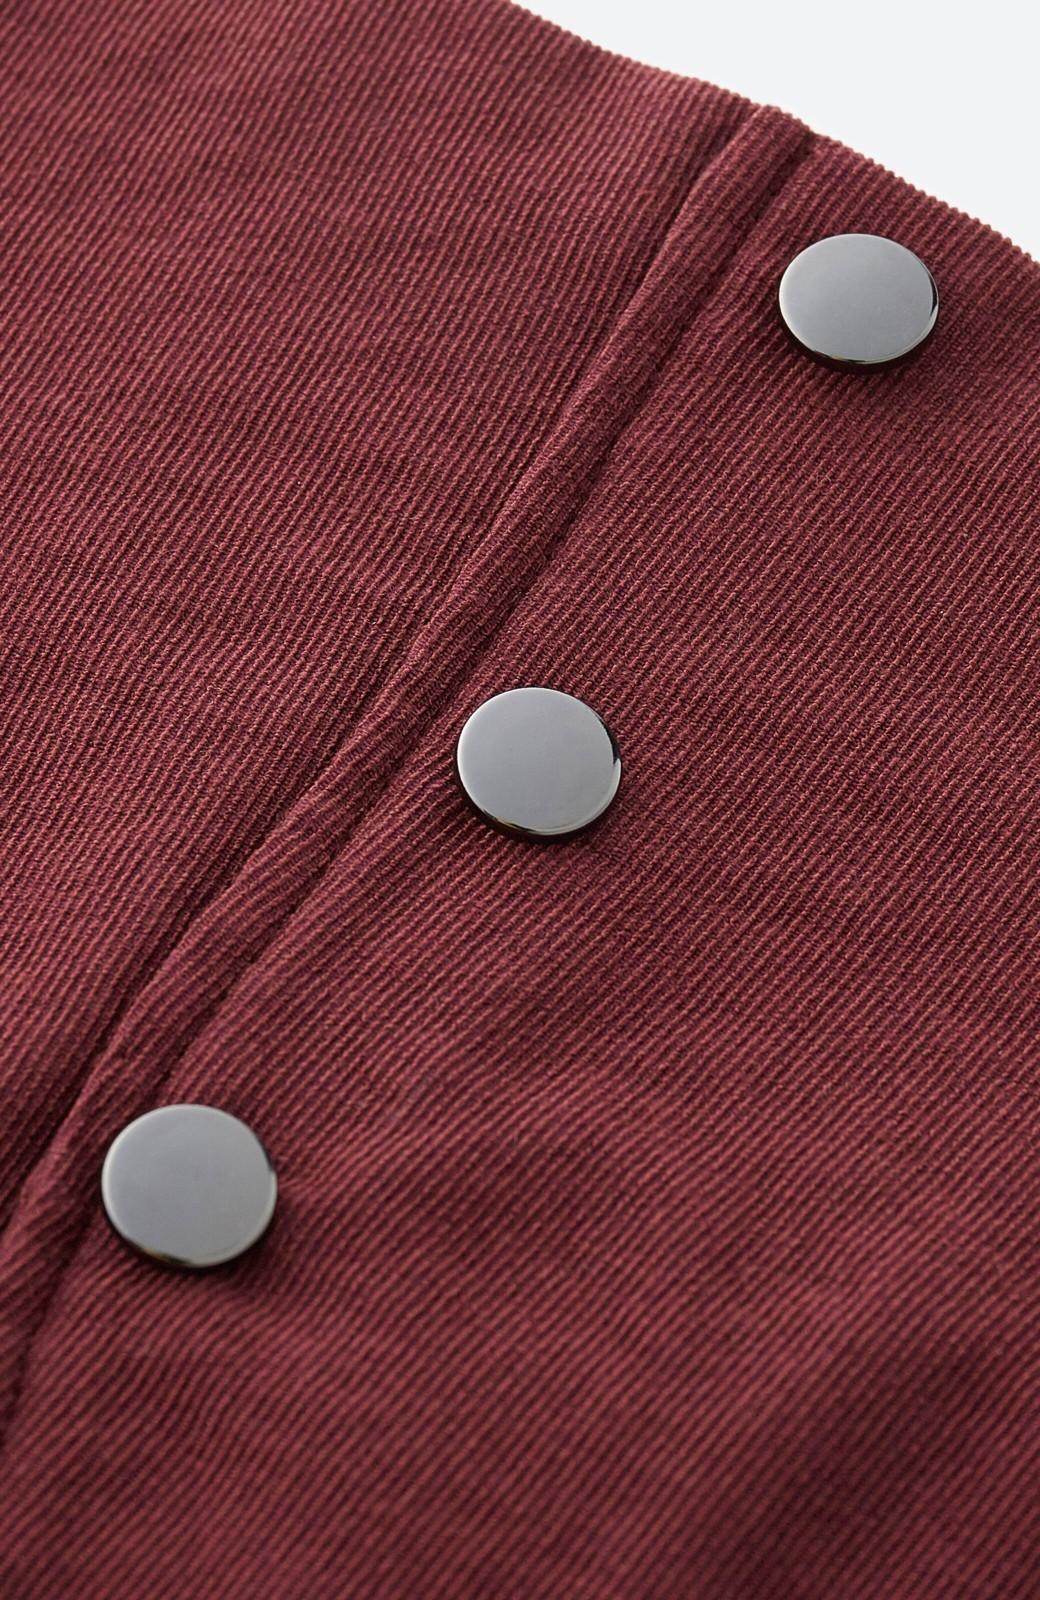 haco!  腹巻きとは呼ばせない ブルー期も華やかに過ごせる消臭加工裏地付きフリルデザインスカートセット【ブルー期】女の子バンザイ!プロジェクト <ボルドー>の商品写真6